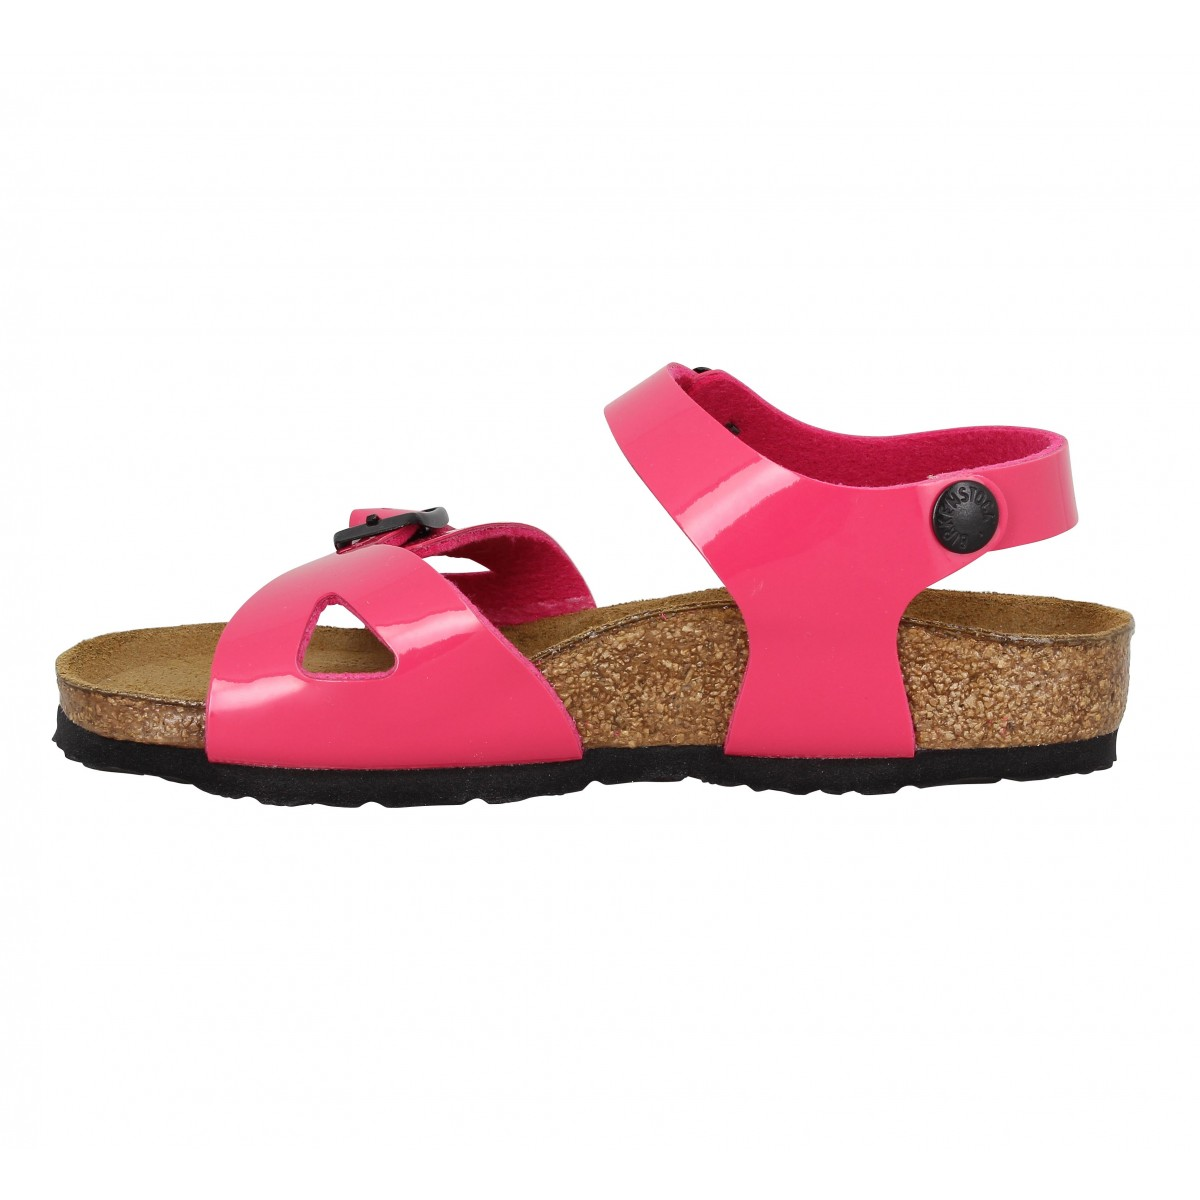 Chaussures Birkenstock Enfant Chaussure Birkenstock Enfant